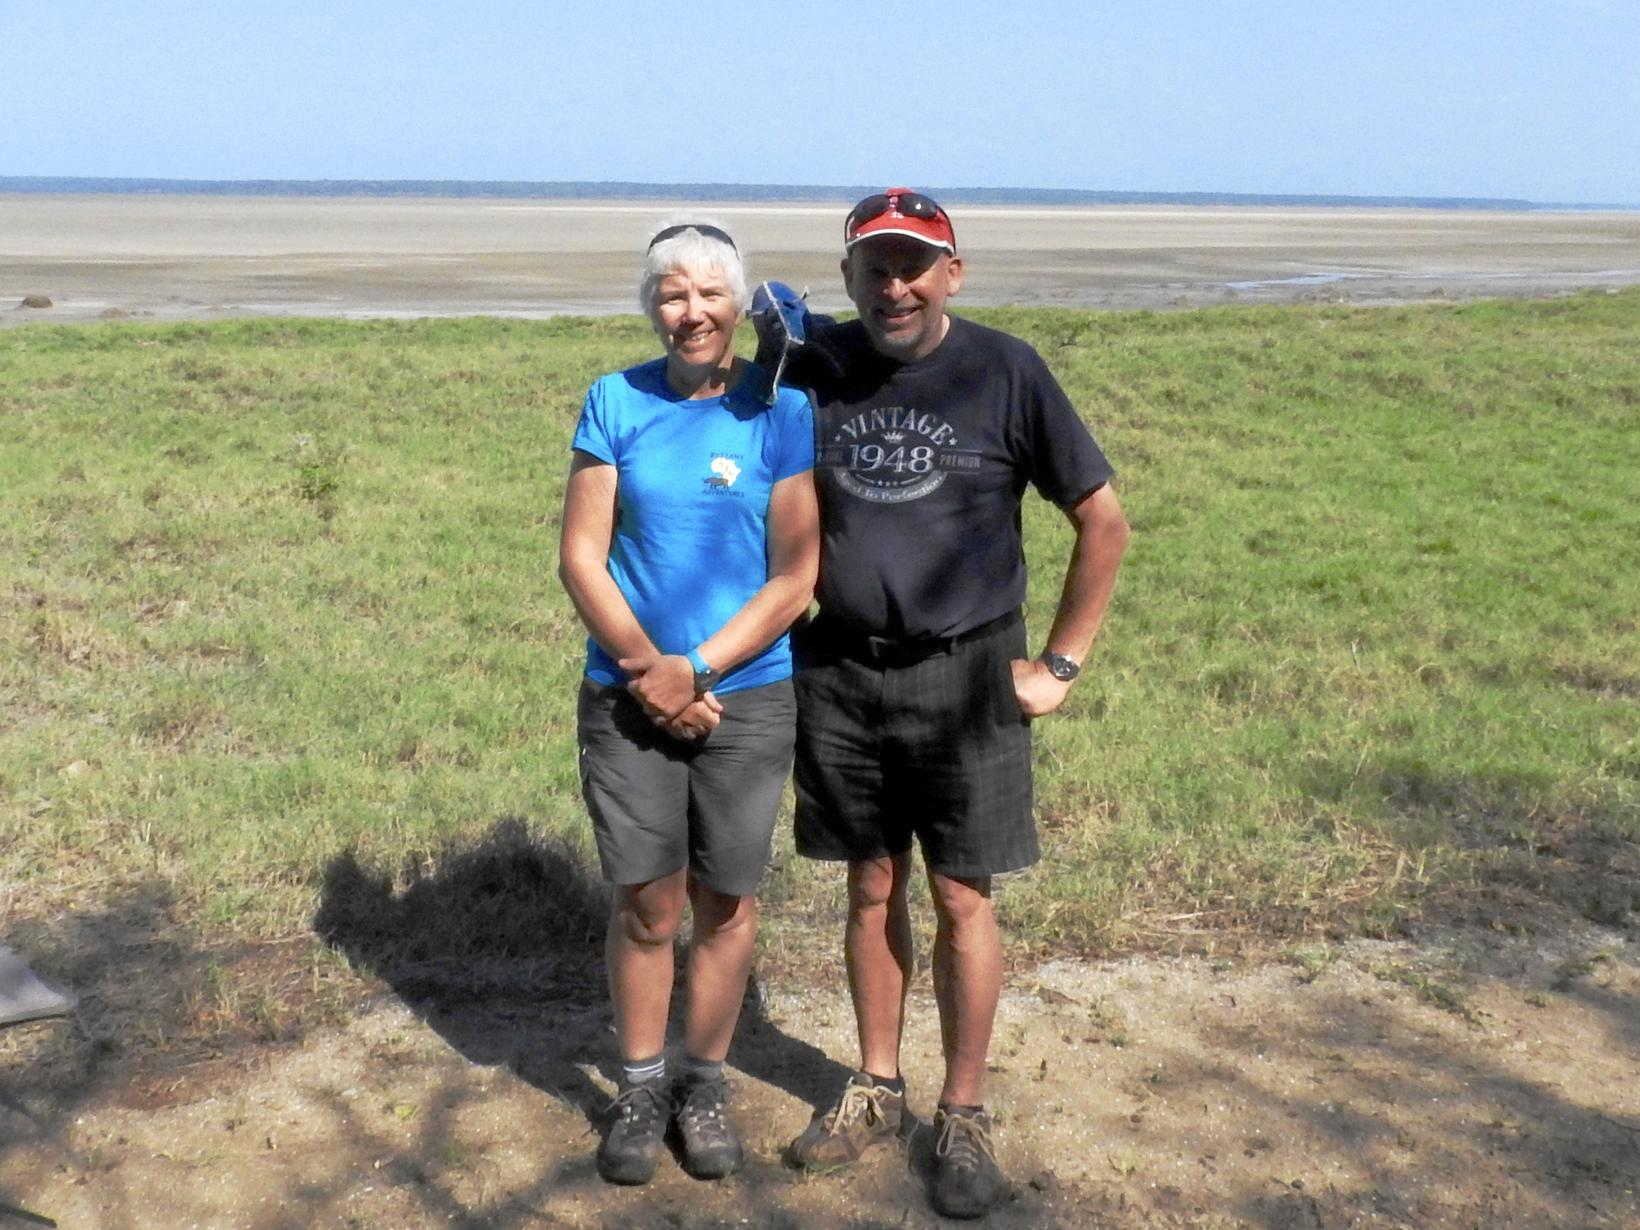 Graham & Cathy from Oxford, United Kingdom